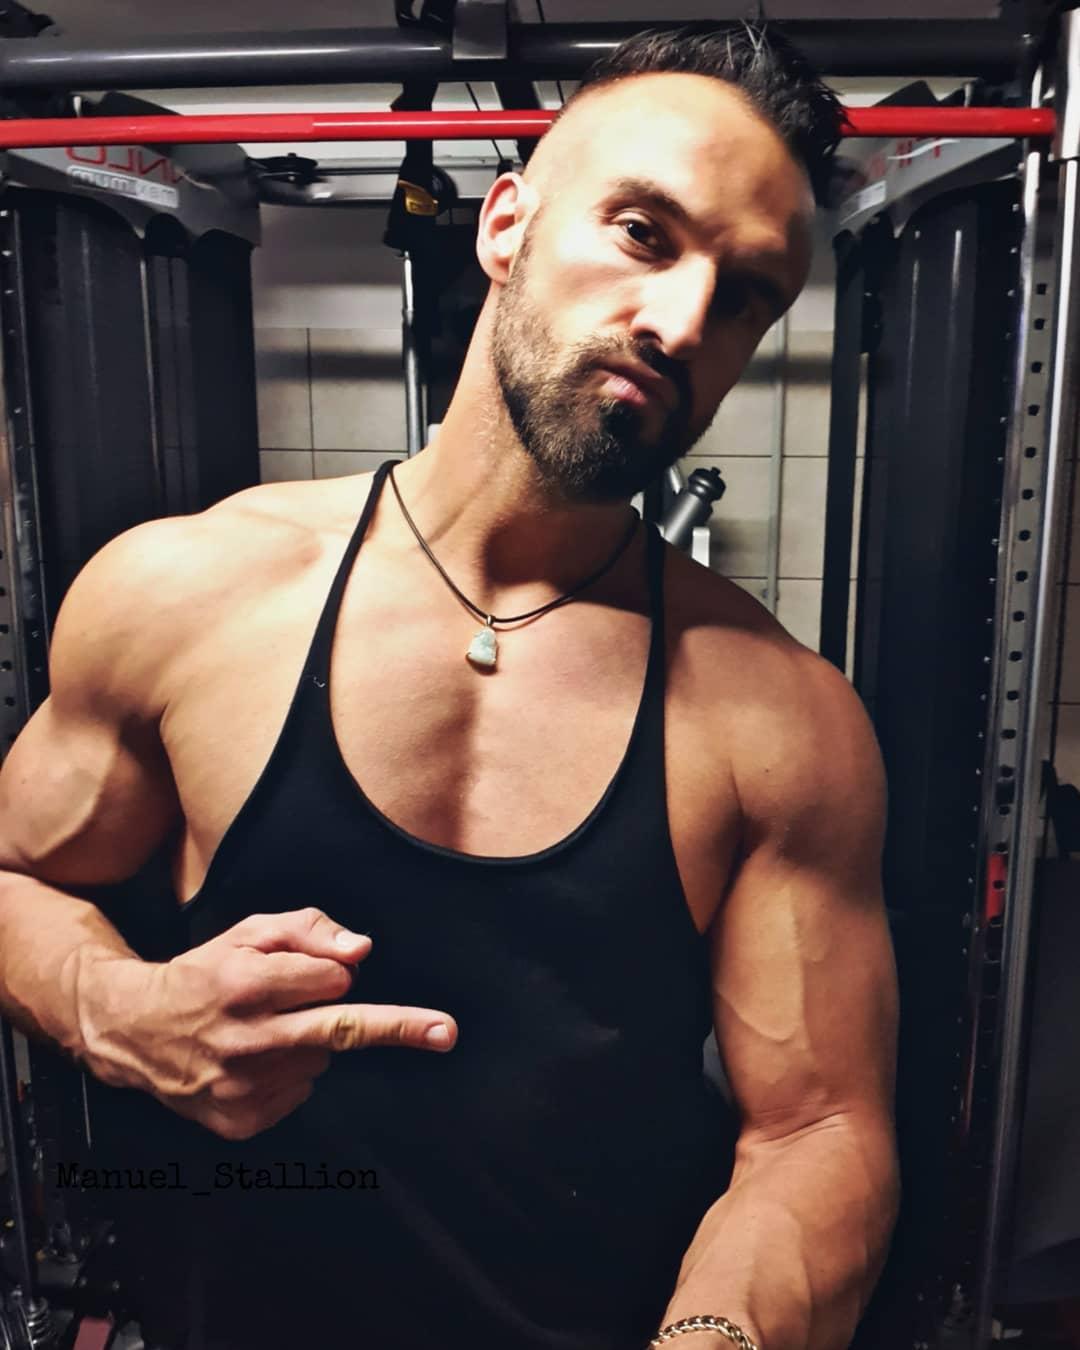 Das Bad Boy Image pflegen muss auch mal sein zwischendurch… 😉😎😘 . #badboy #fitness #bodybuilding #body #fit #fitguy #training #gym #mcfit #johnreed #mcfitspandau #mcfitberlin #muscles #beastmode #pumped #berlinmodel #berliner #berlin #instagood #instalike #fitfam #fitfamgermany #fitfamberlin